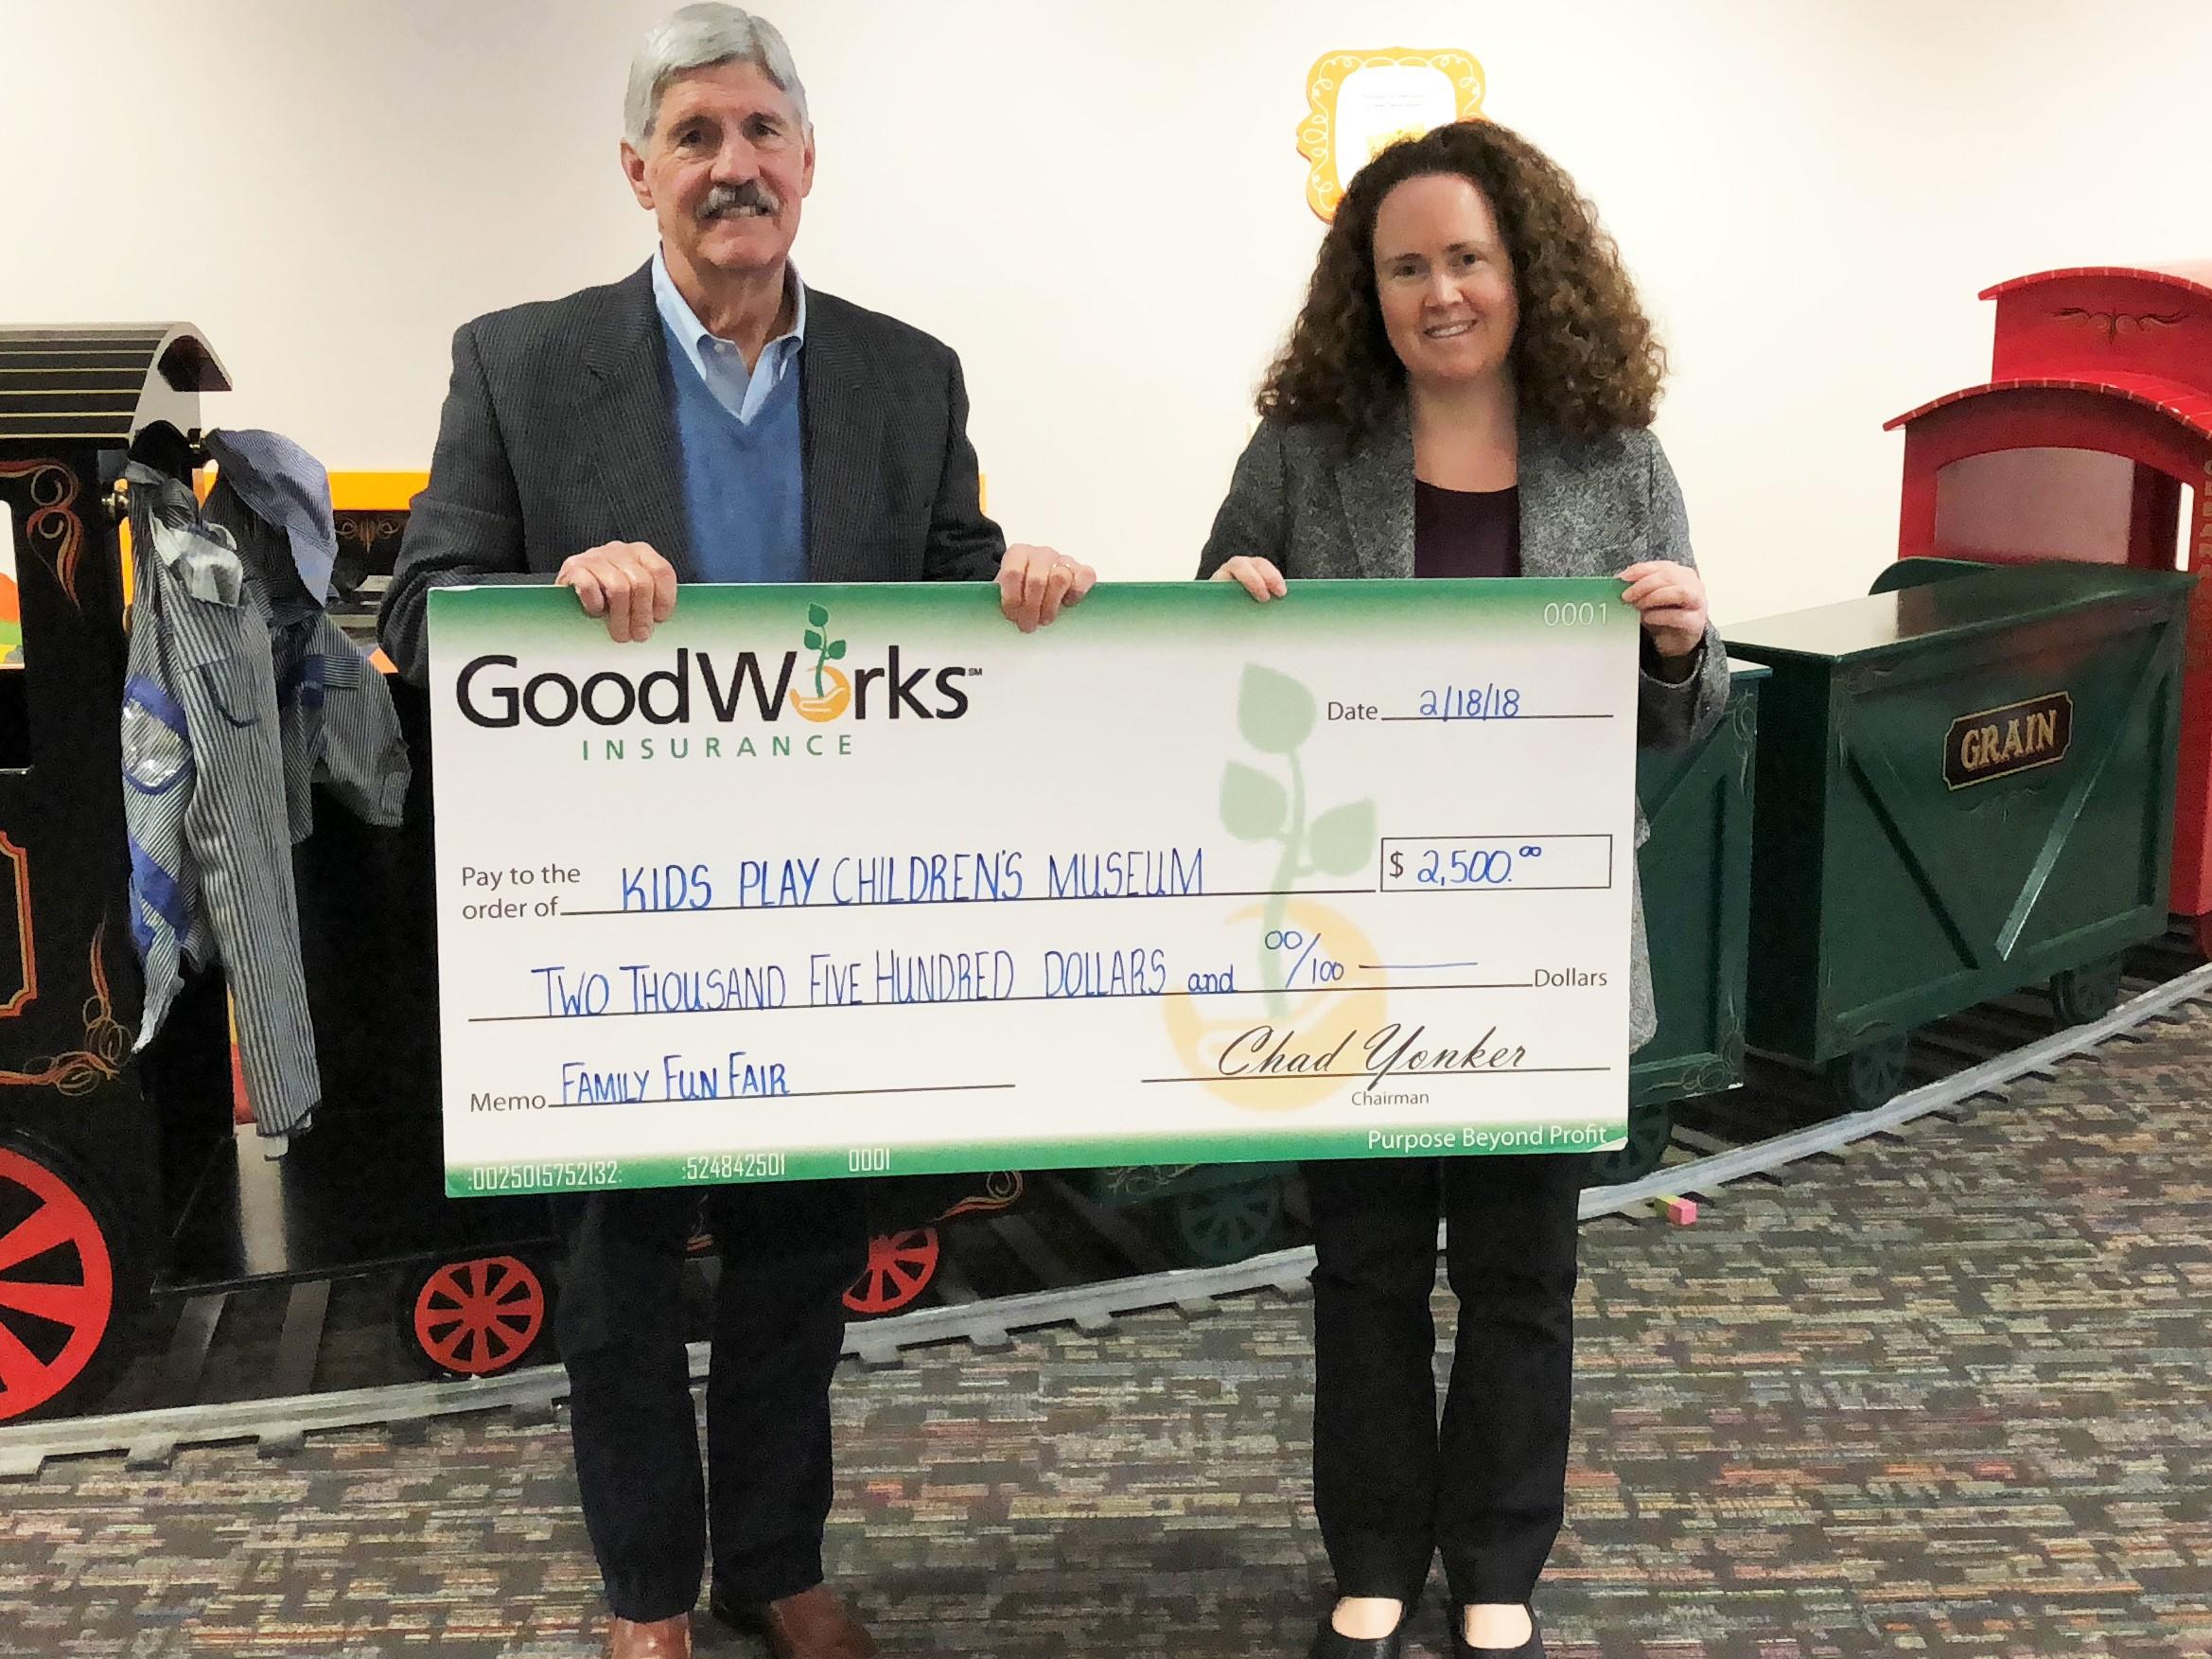 Edward F. Ryan, senior vice president with GoodWorks Insurance, presents check to Eileen Marriott, KidsPlay Children's Museum director.